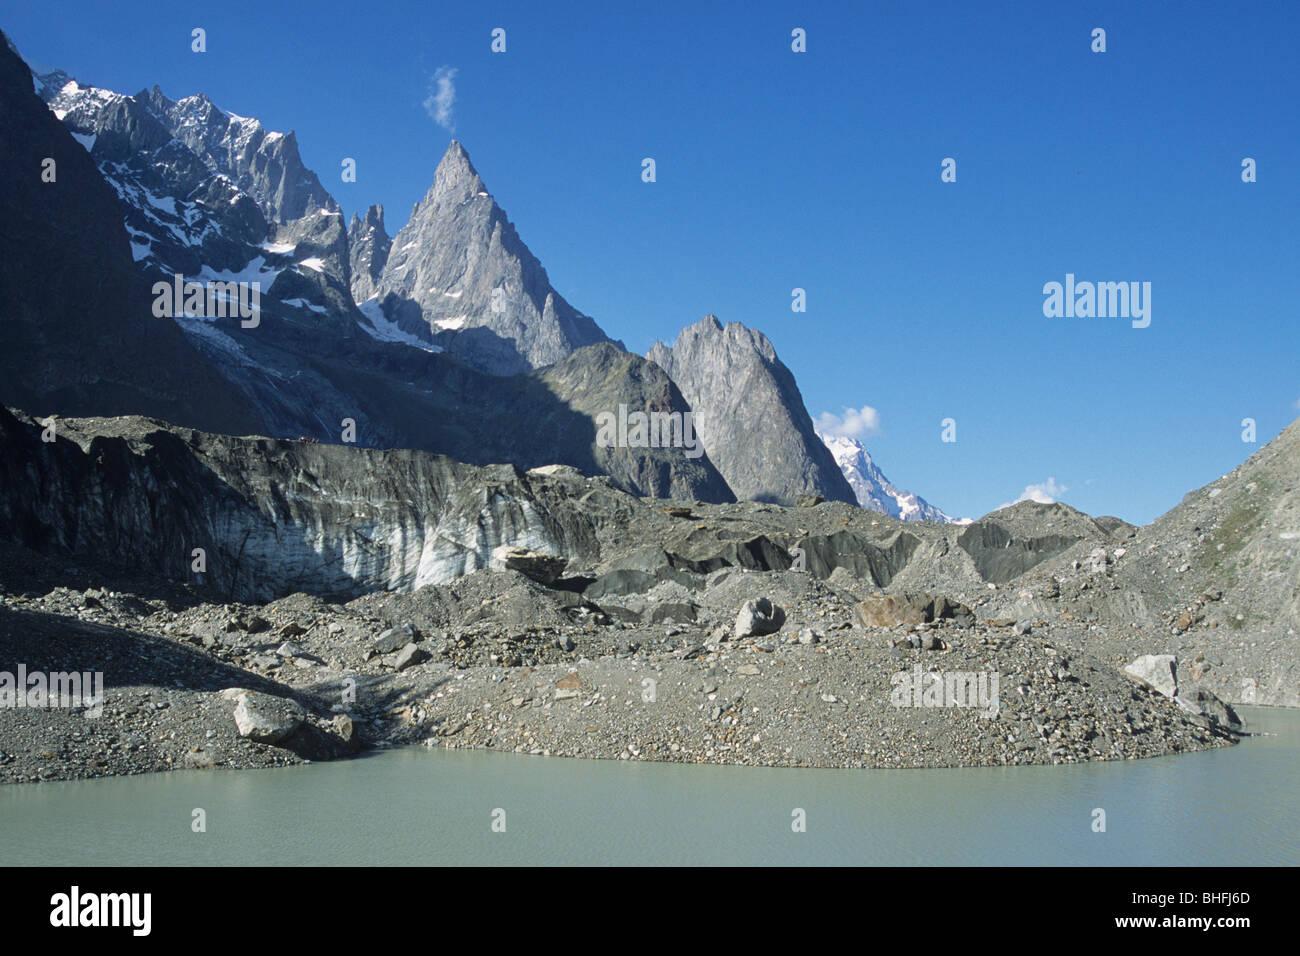 mont blanc (monte bianco), aiguille noire and aiguille blanche, miage lake and glacier, val veny, courmayeur, valle - Stock Image